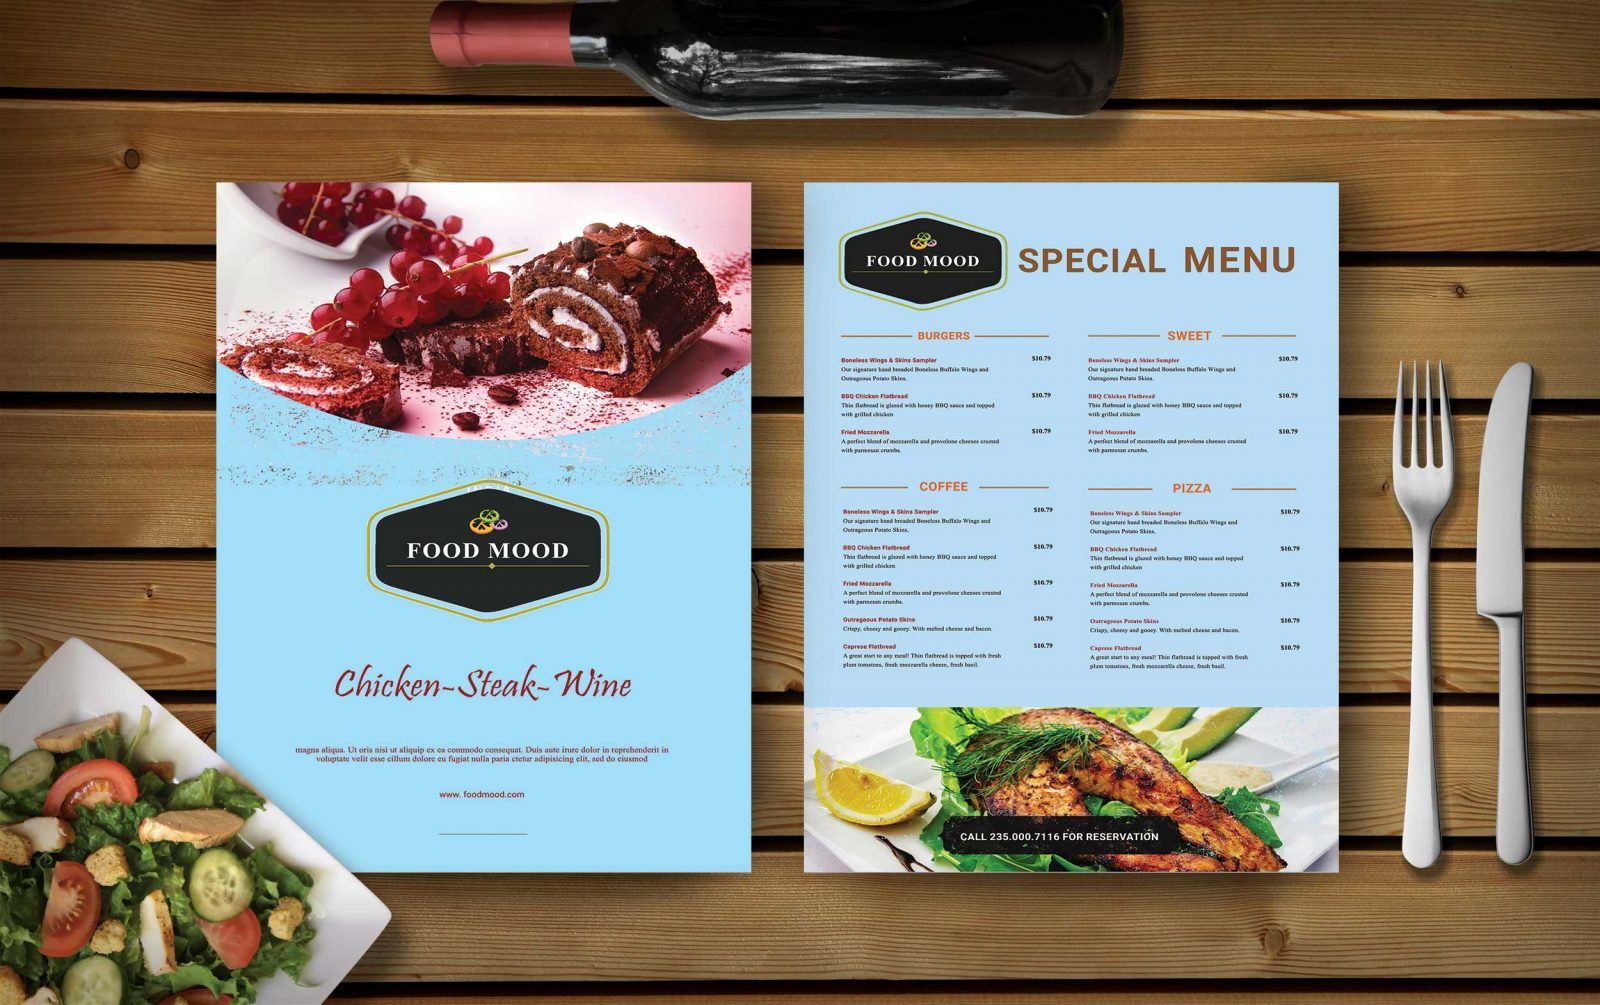 Free Menu Card Psd Mockup Specially Designed For Sweet Shop Cafe Menu Card Psd Mockup Food Menu Template Cafe Menu Design Menu Design Template